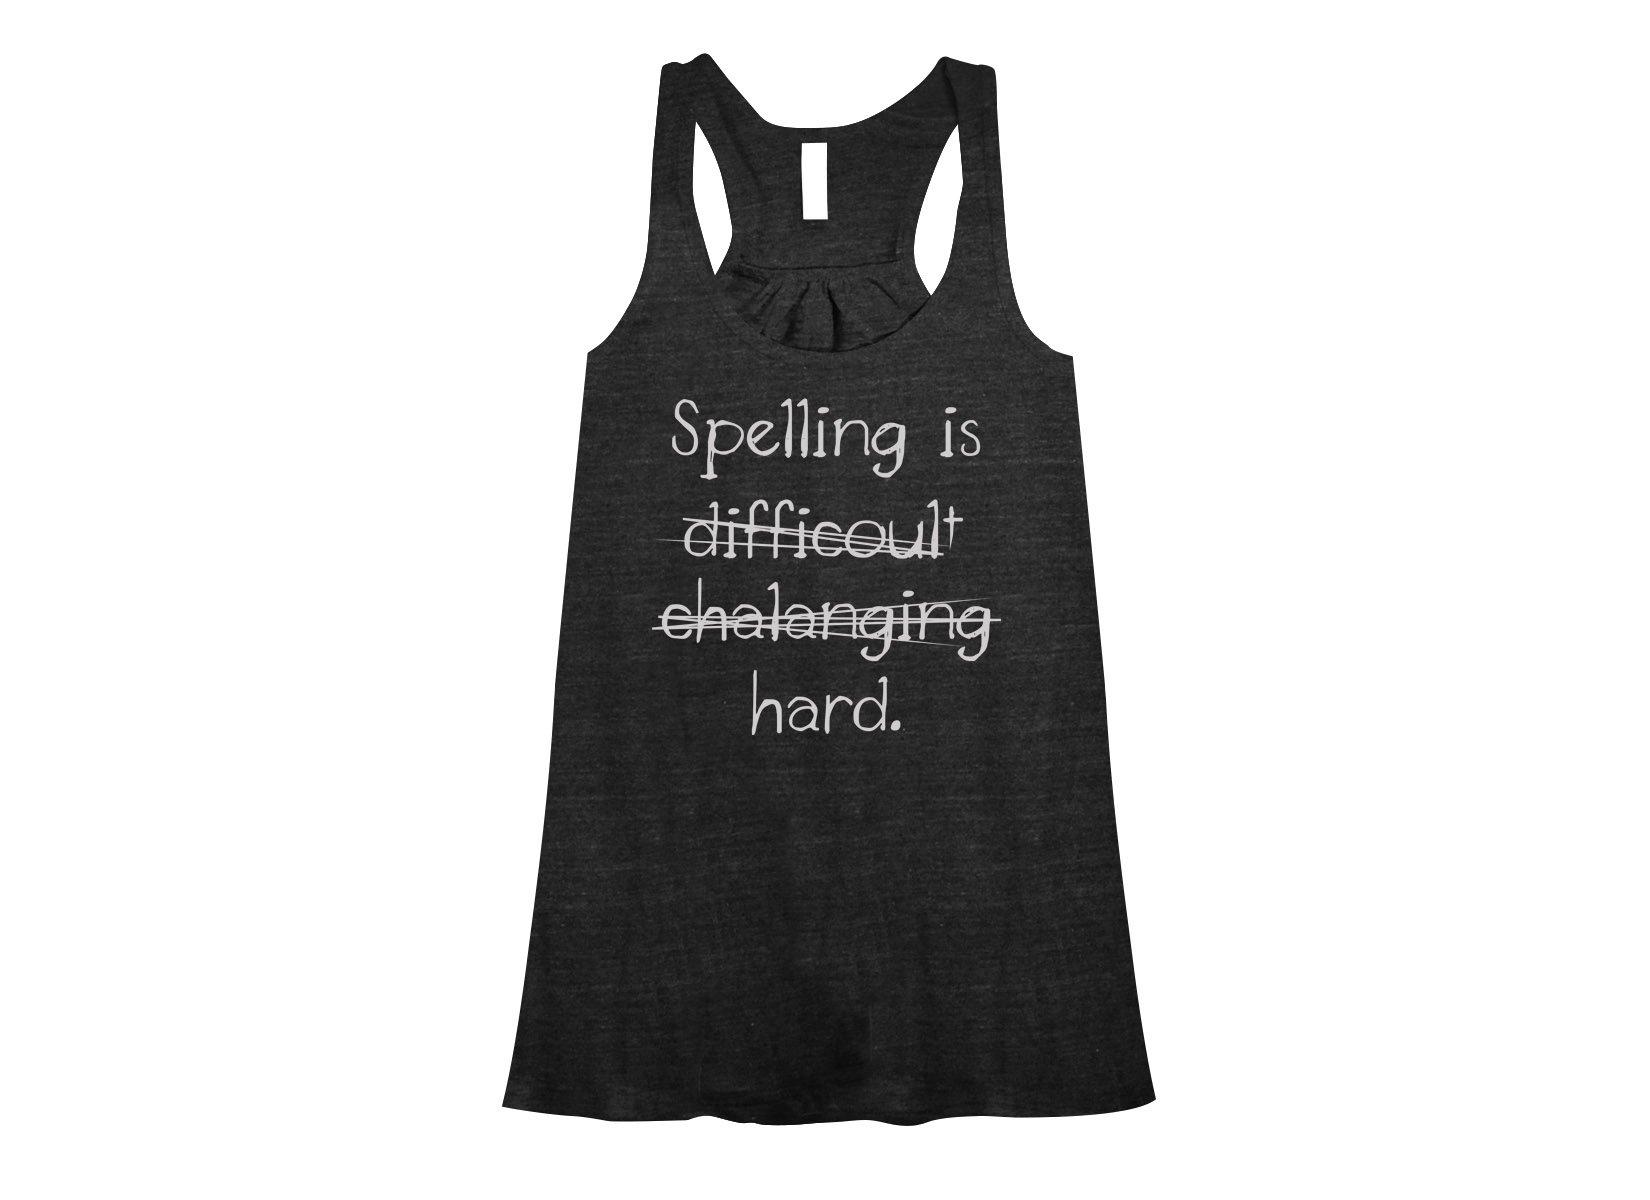 Spelling Is Hard on Womens Tanks T-Shirt